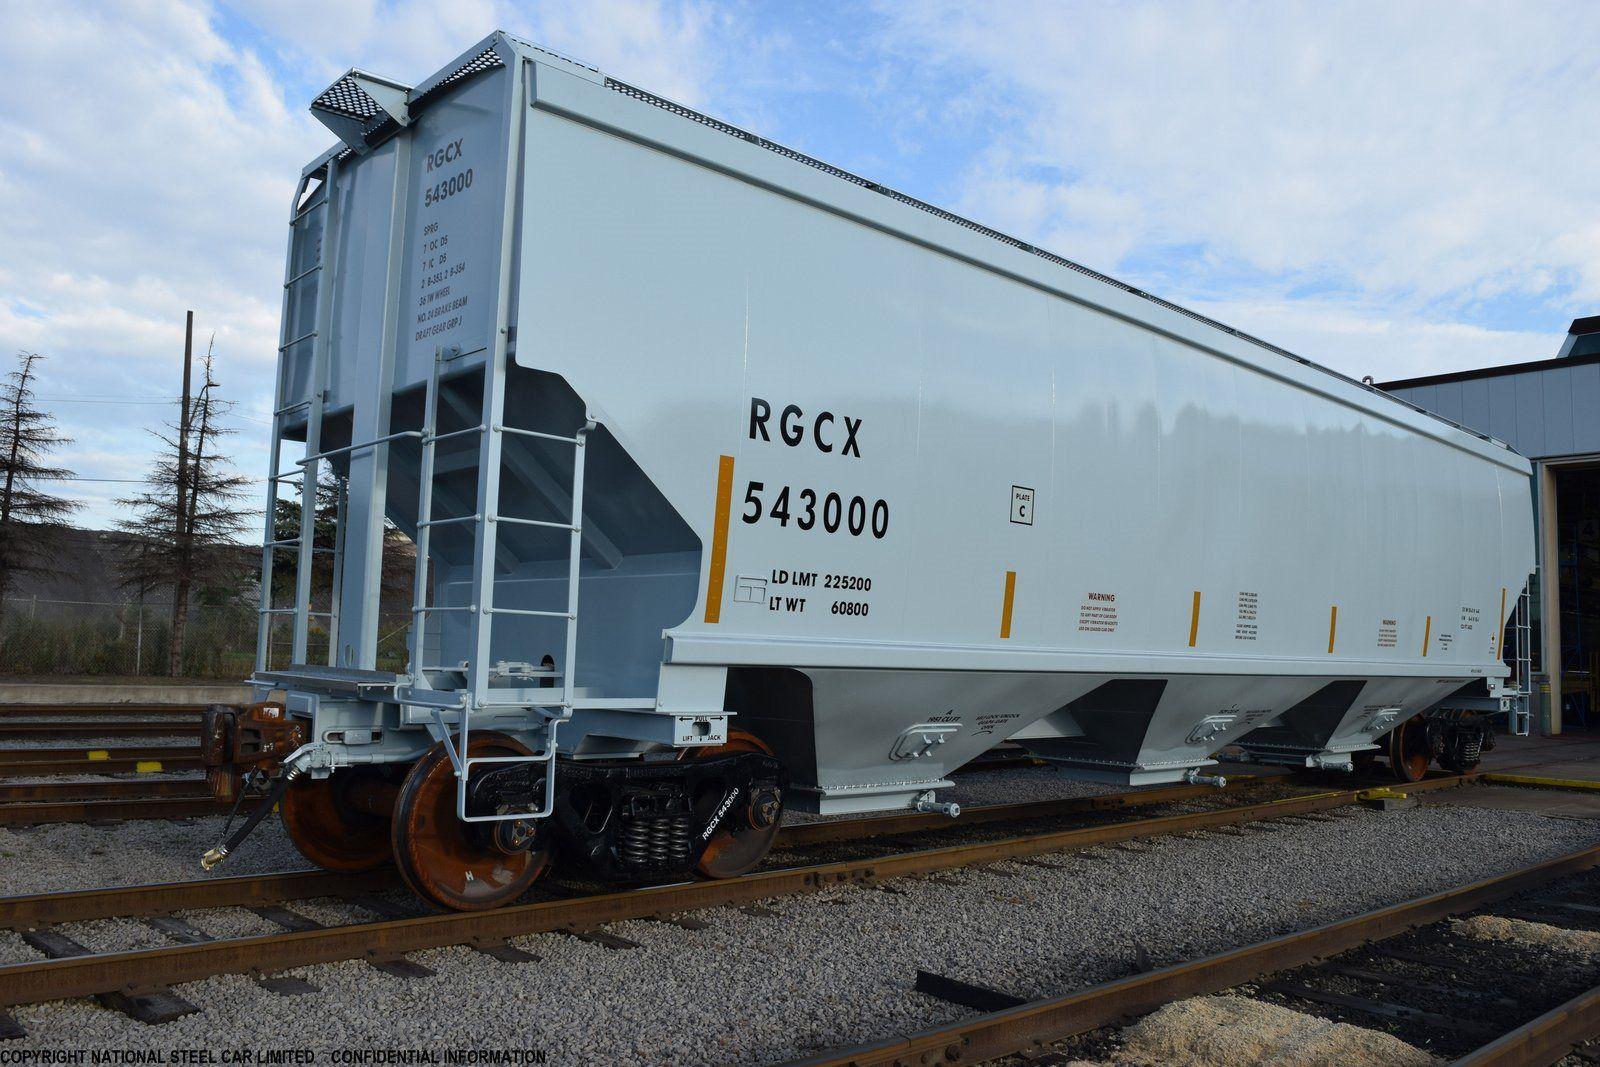 Transportation Company - Rio Grande Chemicals - Railroad Equipment